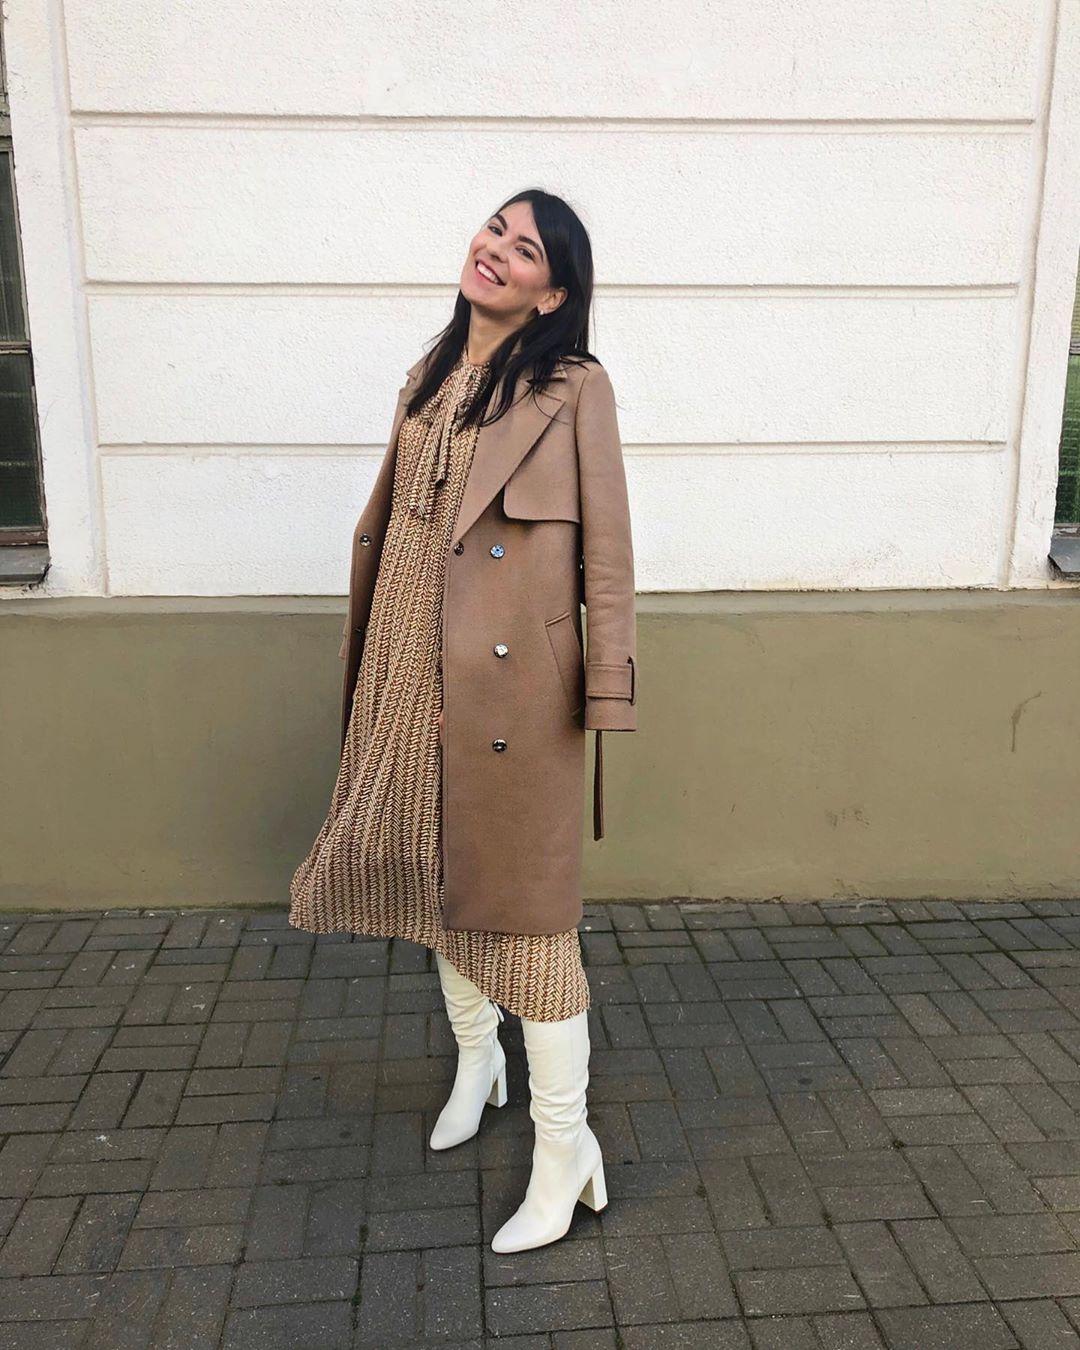 high heeled leather knee high boots de Zara sur katerinazimich